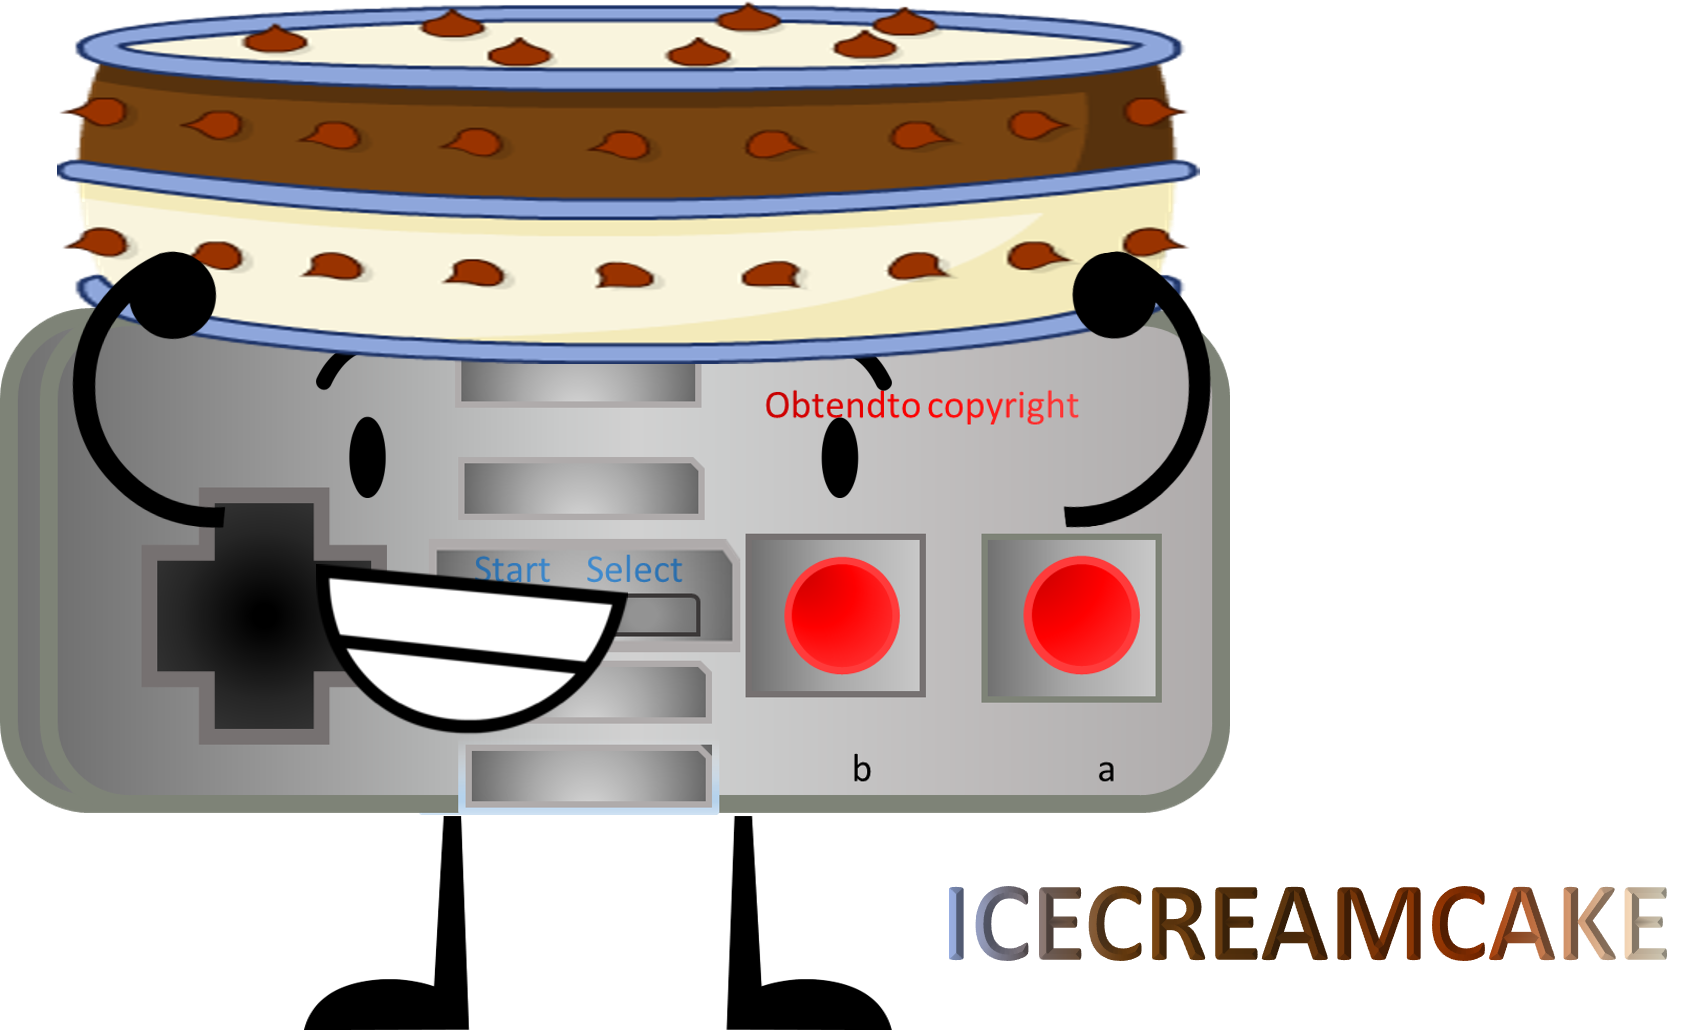 icecreamcake logo